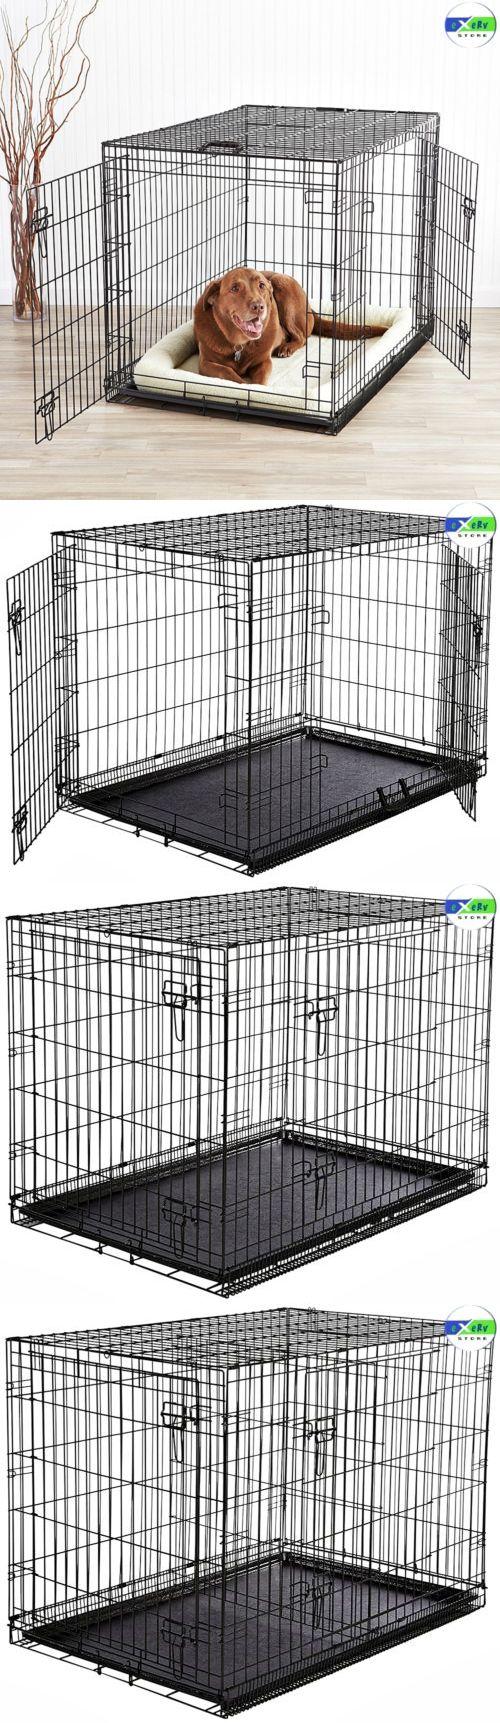 best 25 large dog crate ideas on pinterest folding dog crate large dogs and extra large dog crate